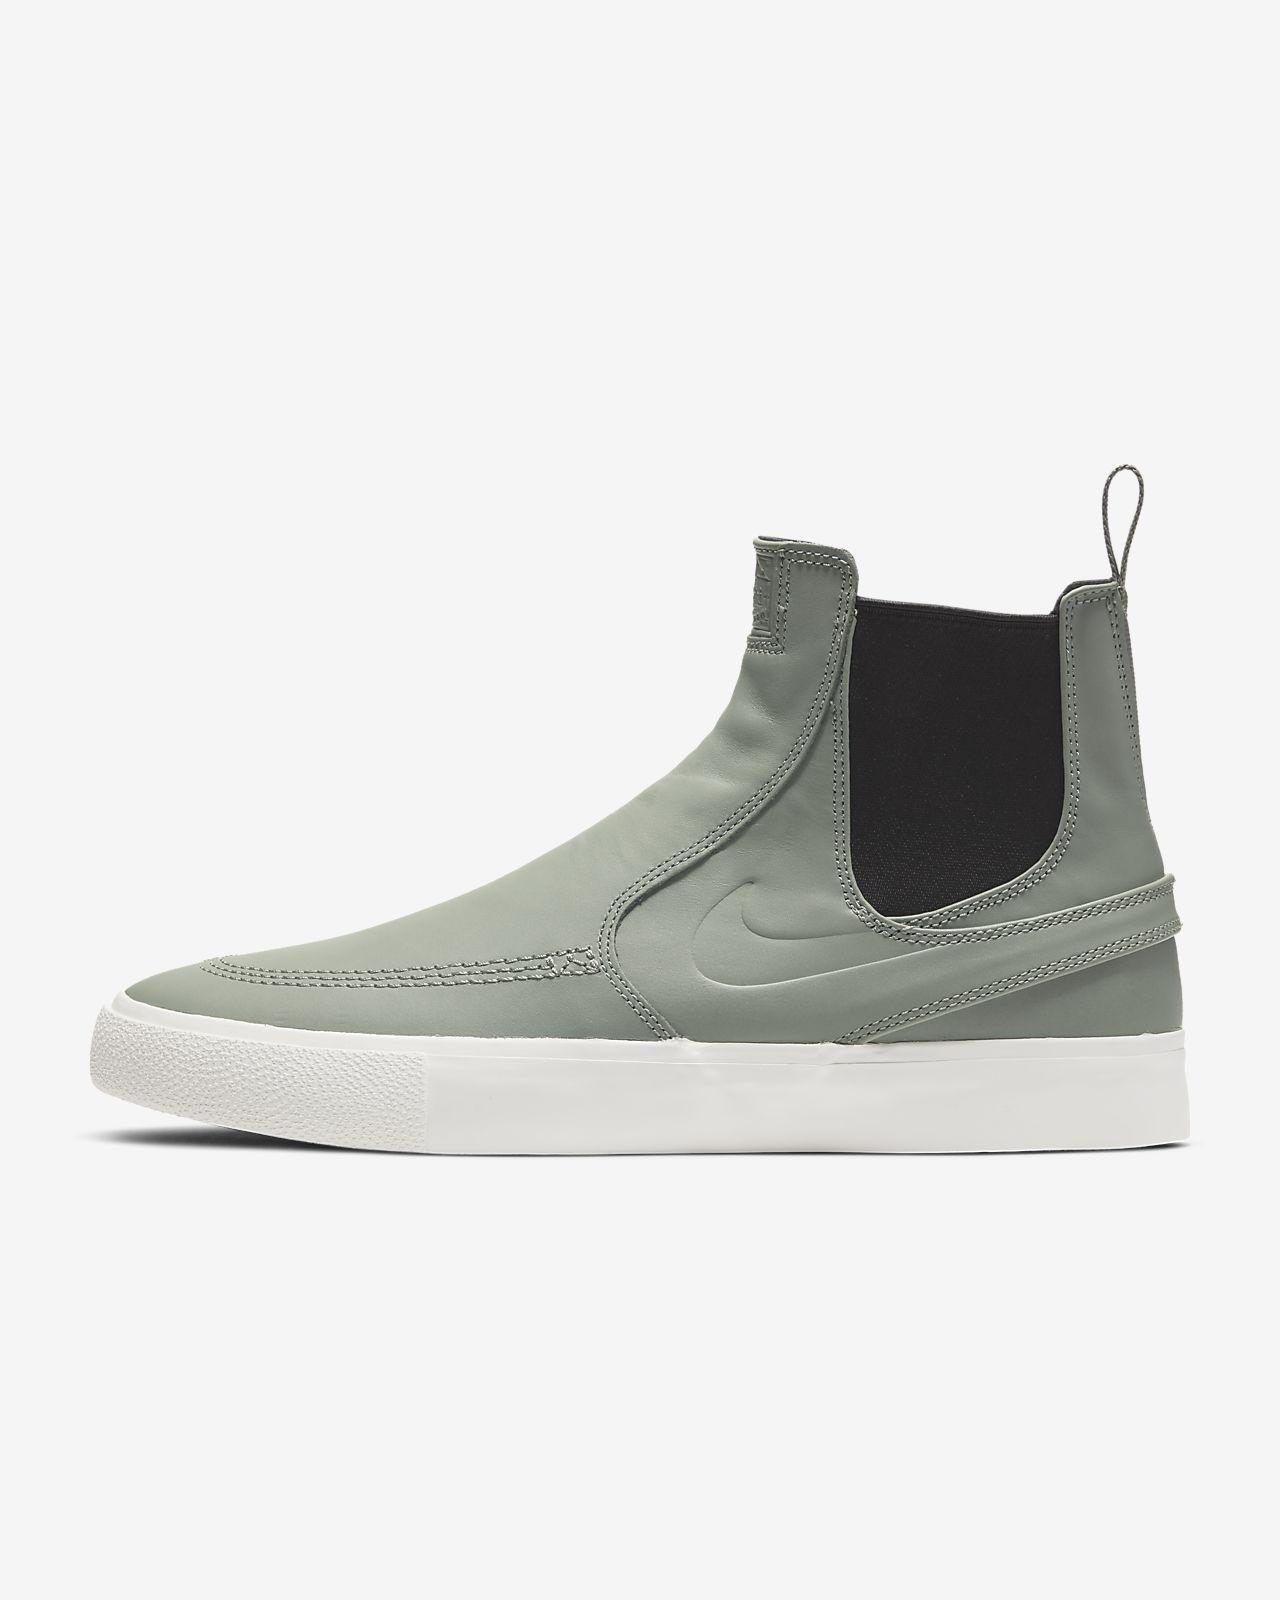 Nike SB Zoom Stefan Janoski Slip Mid RM Skate Shoe